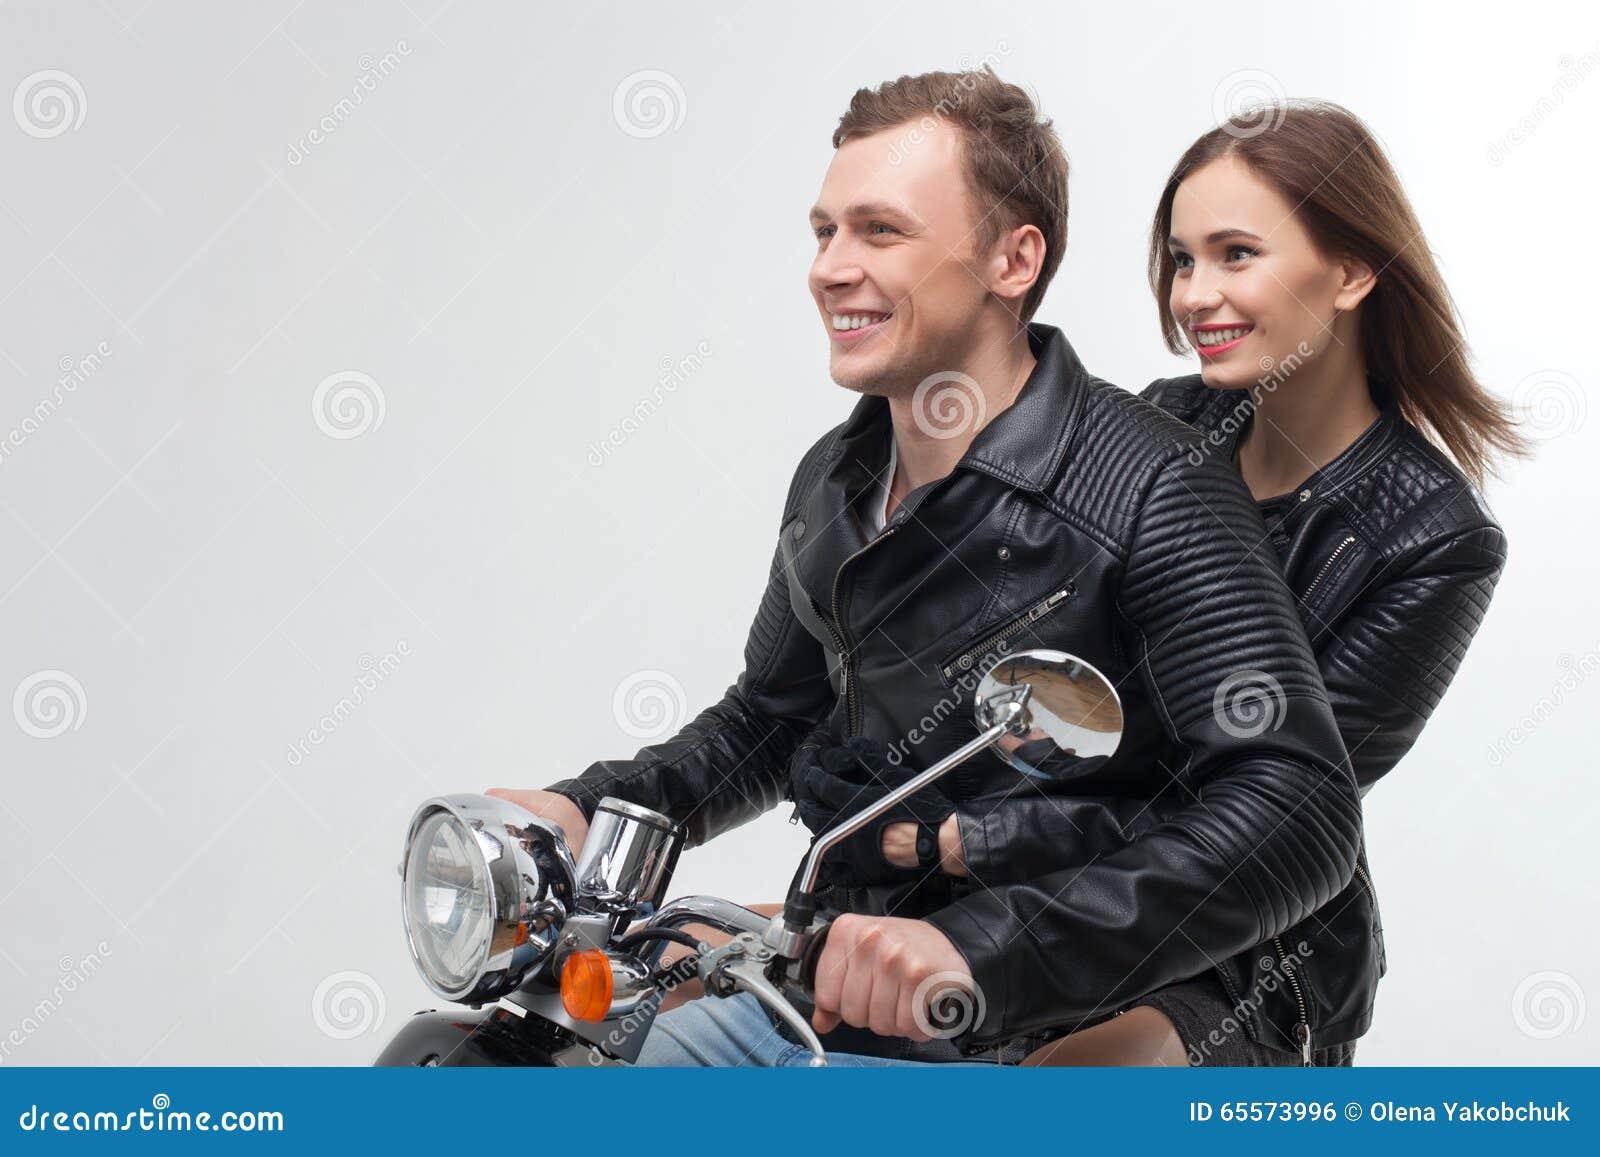 Motor dating